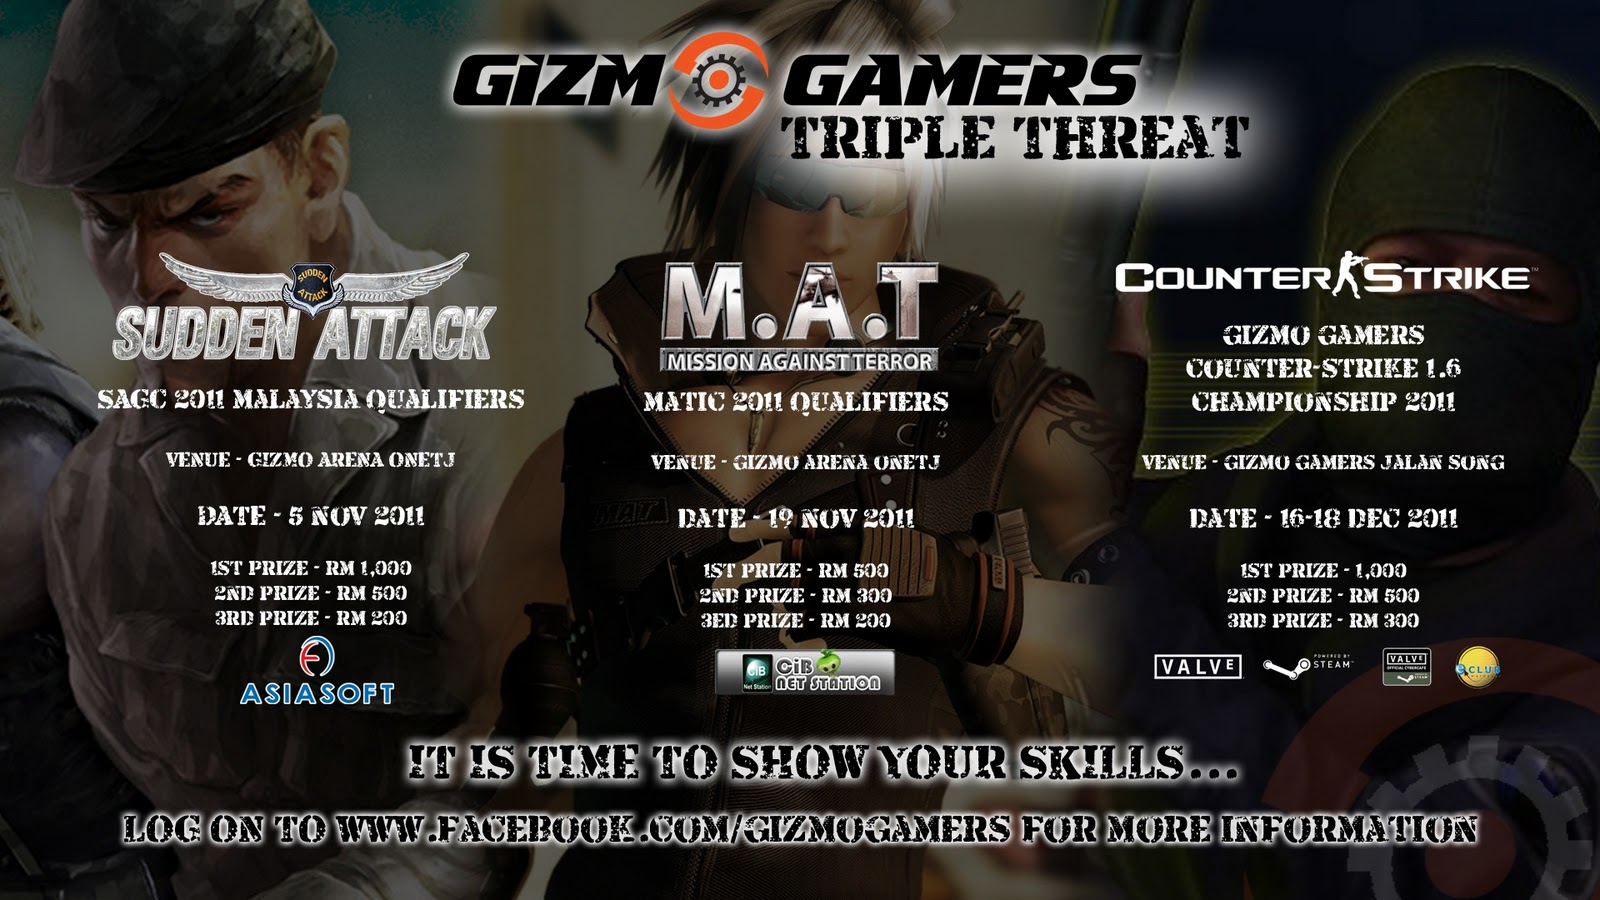 Visit kuching today gizmo gamers triple threat for Home wallpaper kuching